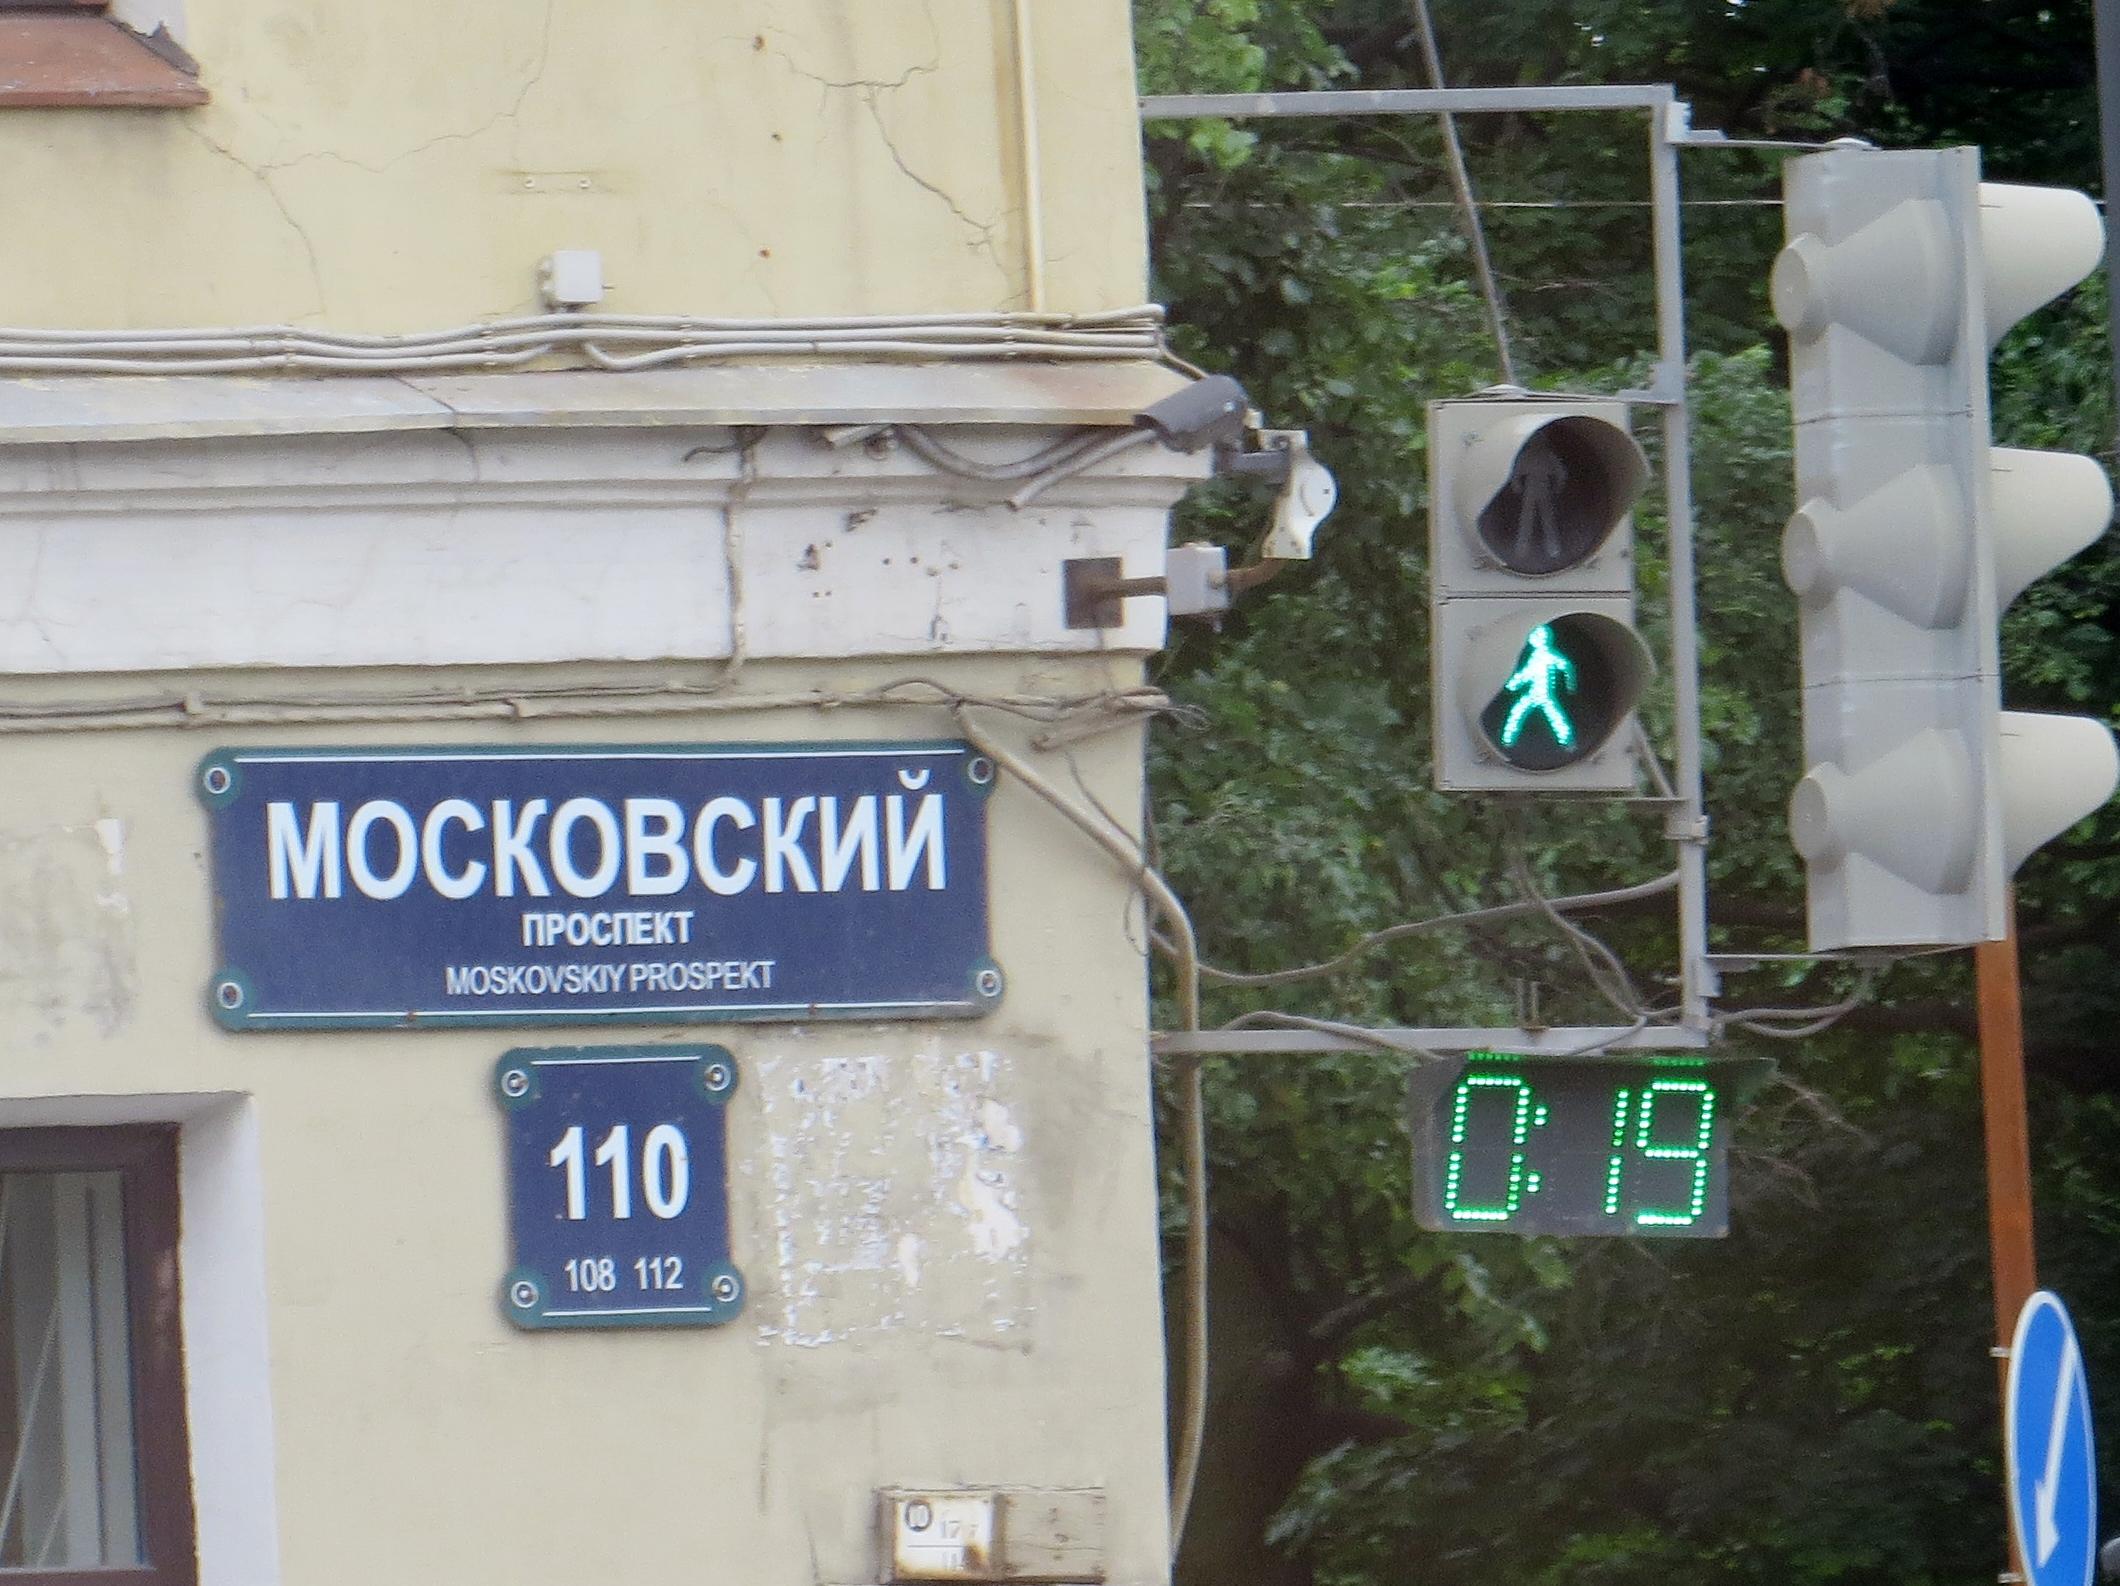 St. Petersburg Russia city views